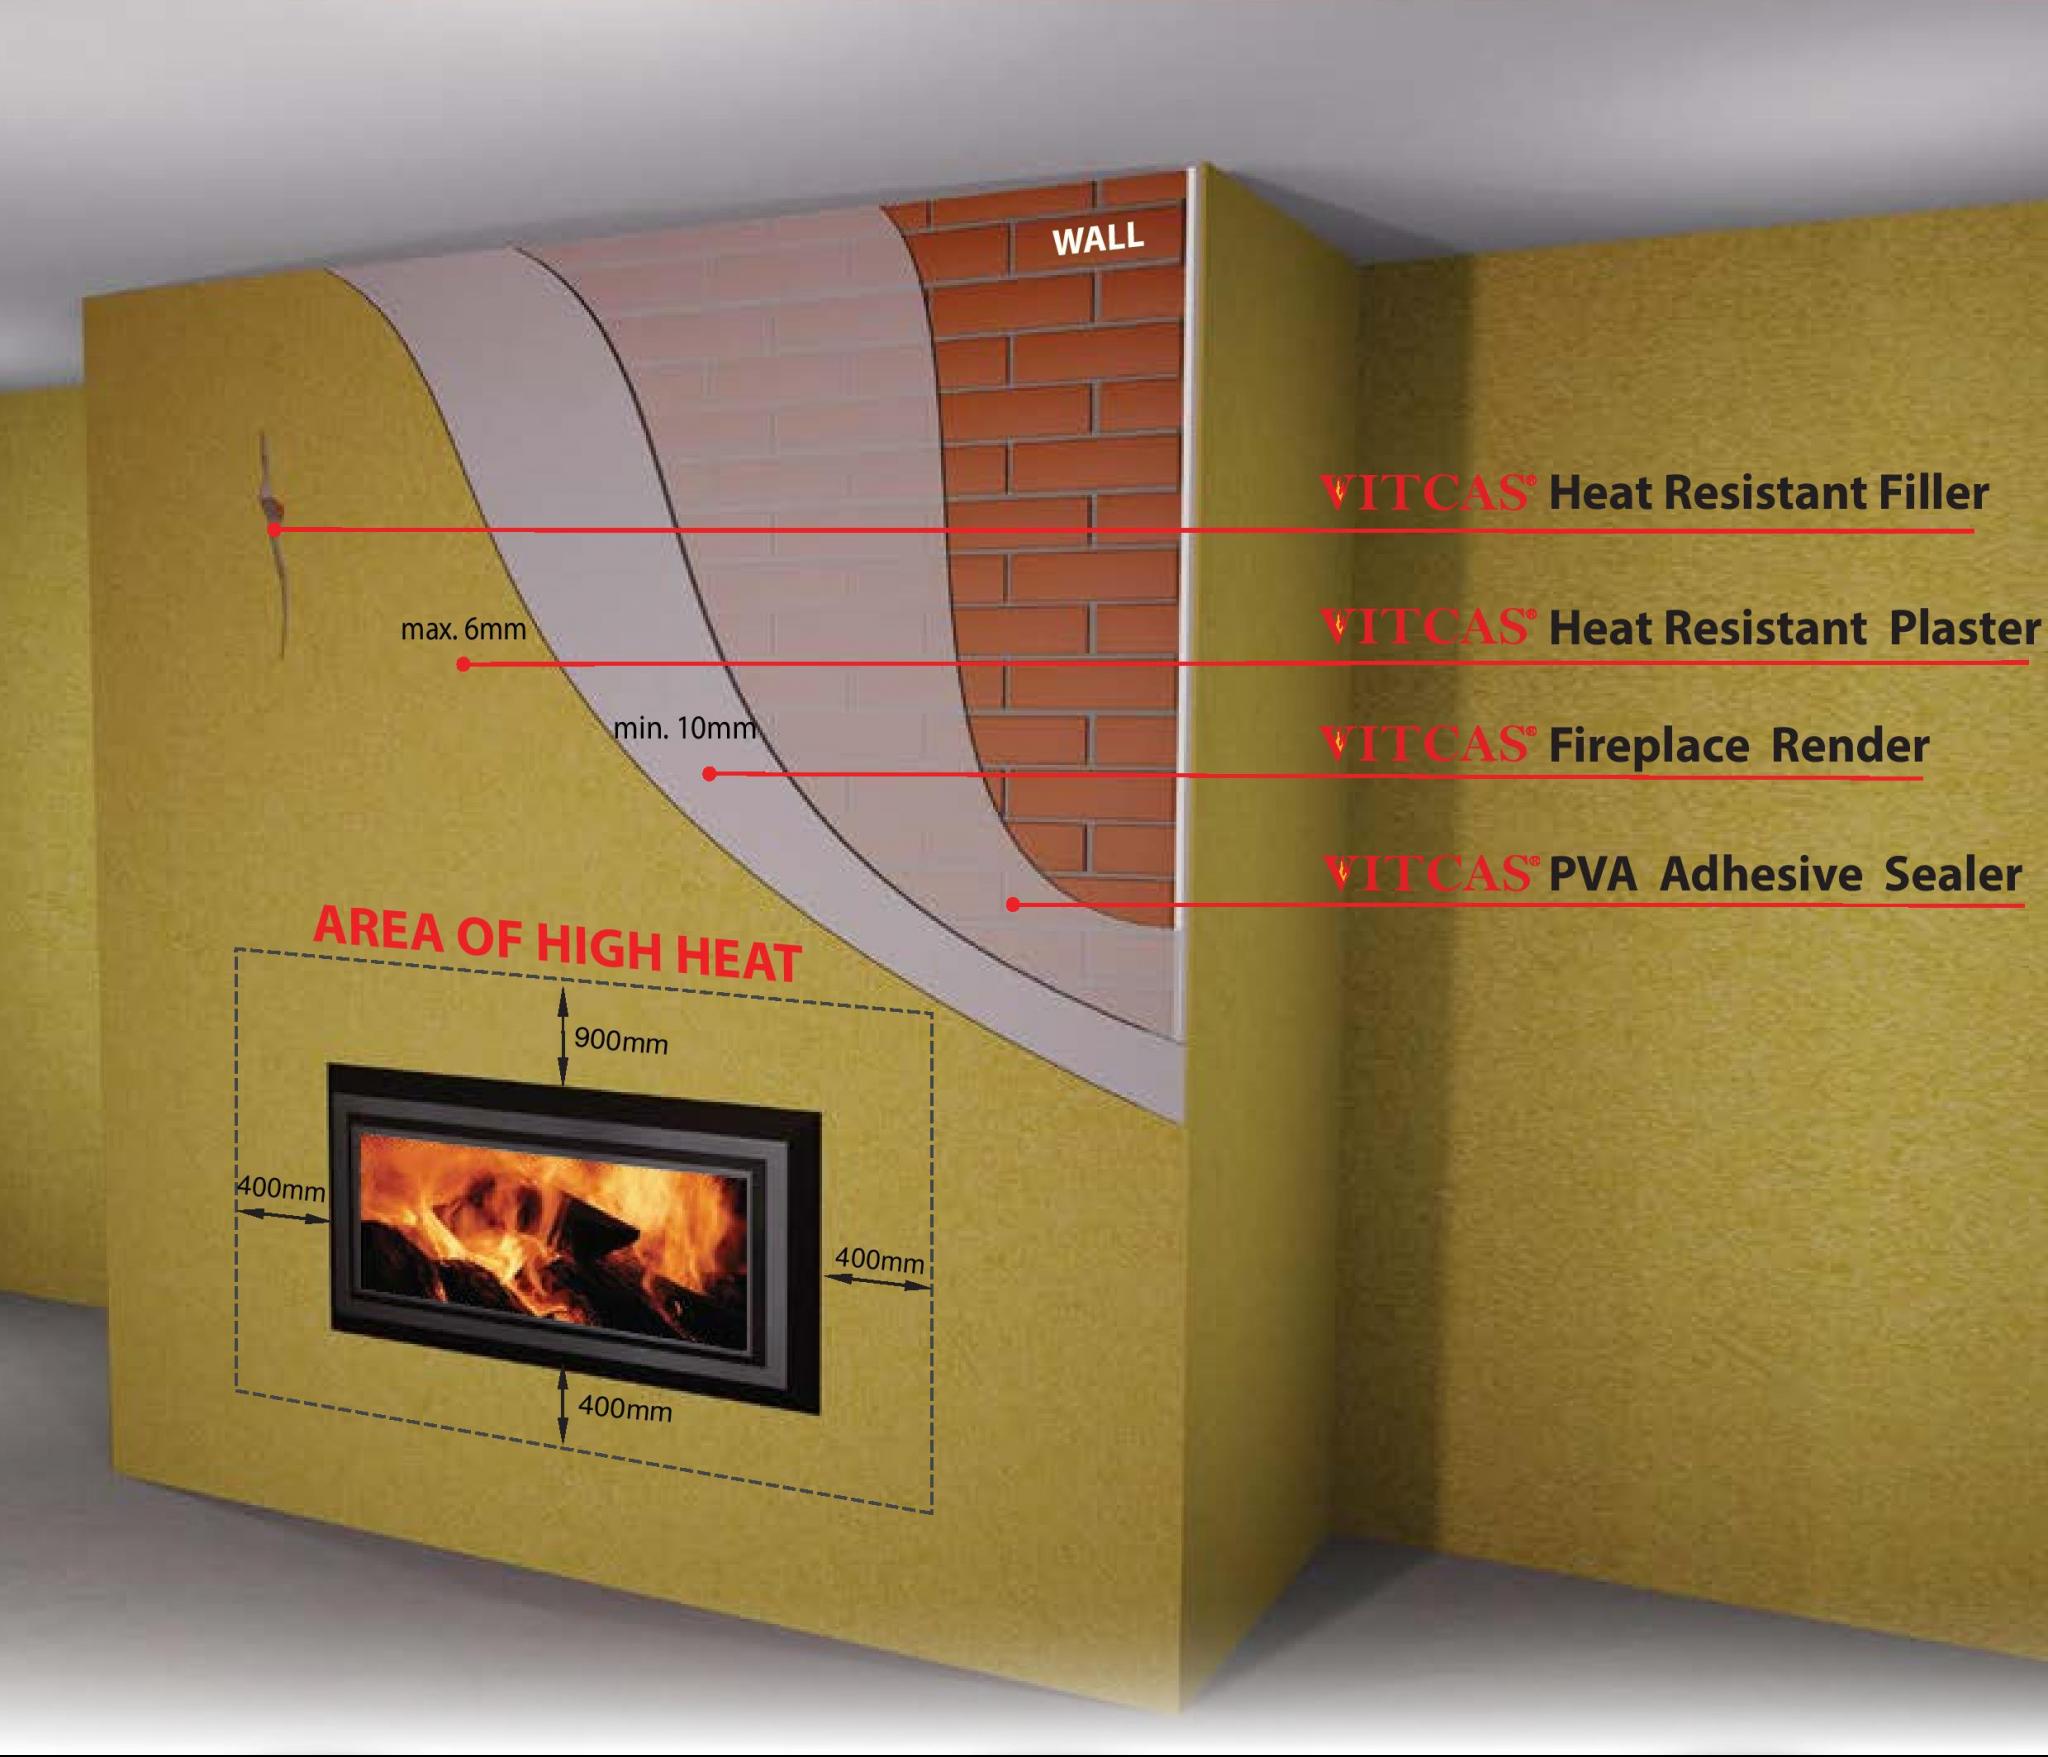 Fire Resistant Plaster : Heat resistant plaster plastering a fireplace